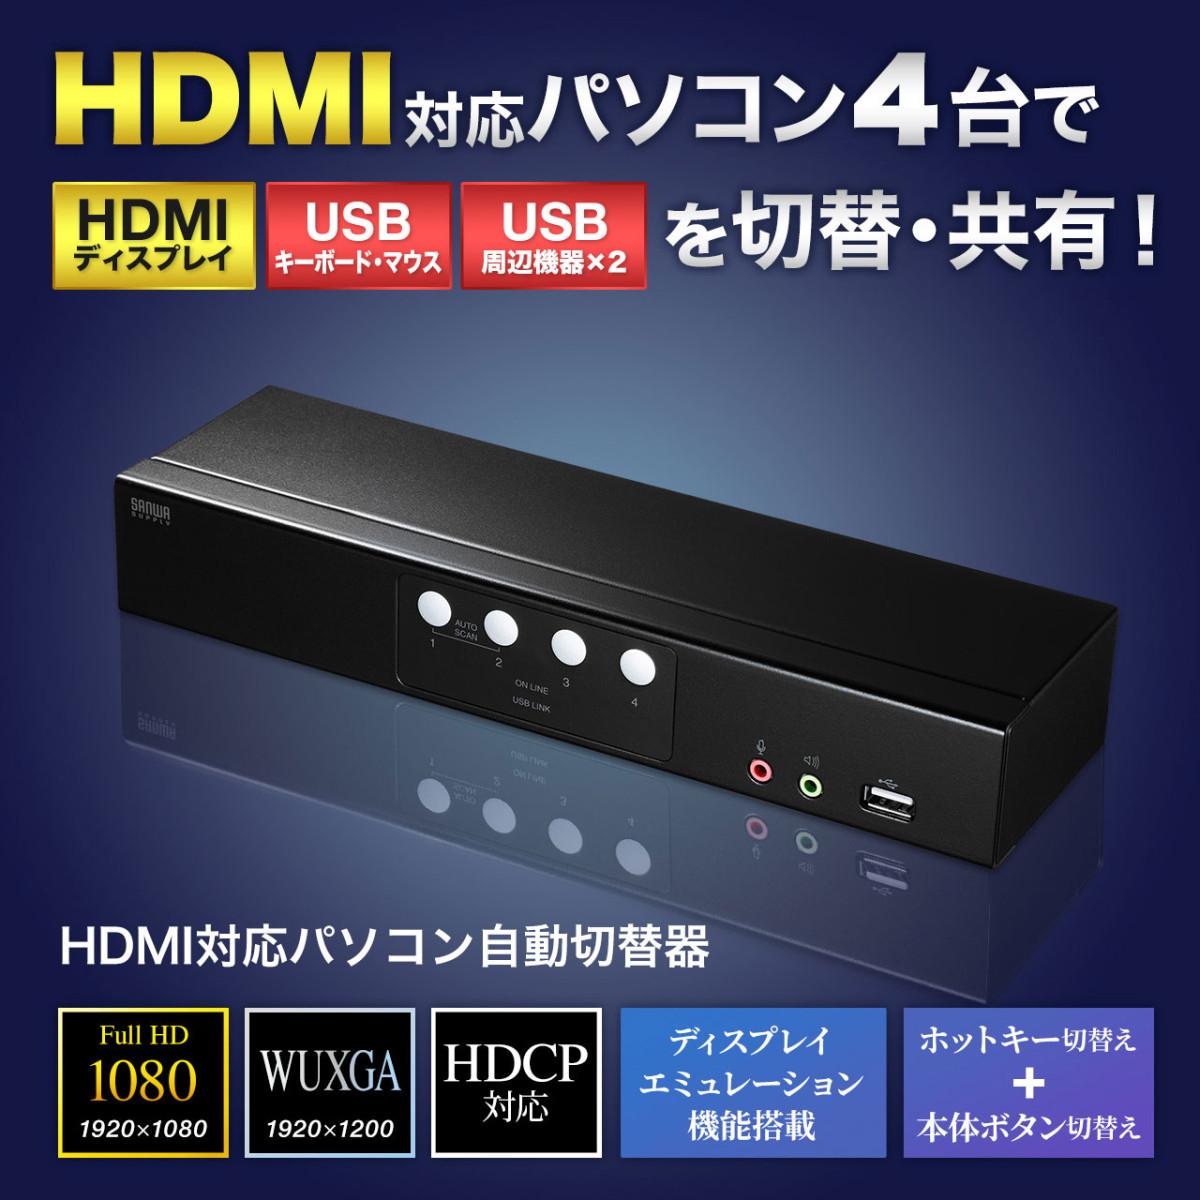 [SW-KVM4HHC] HDMI対応パソコン自動切替器(4:1)